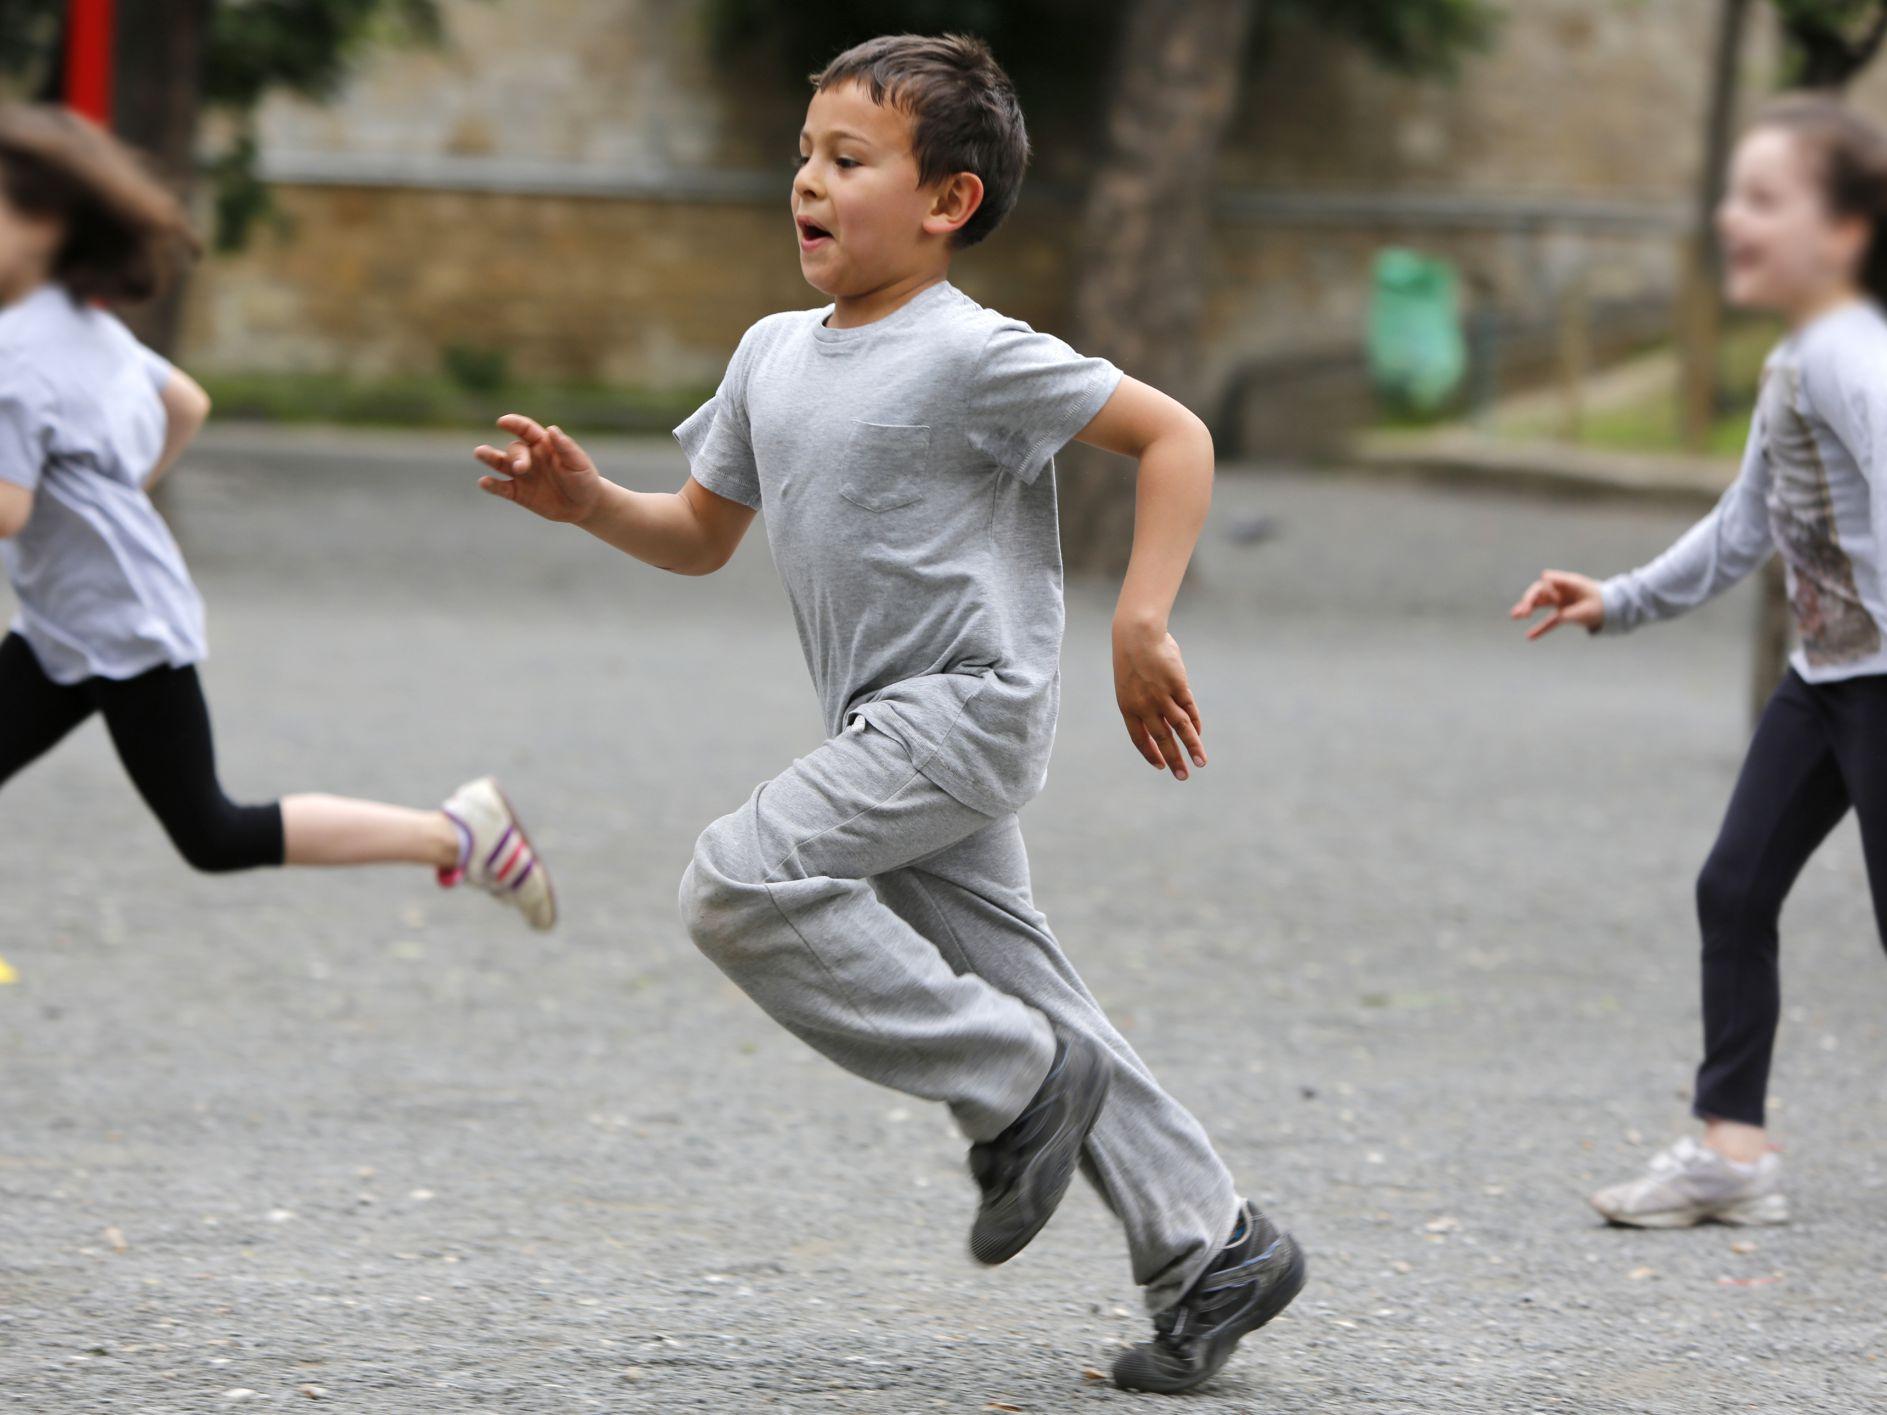 child need to start exercising, healthy pediatrics